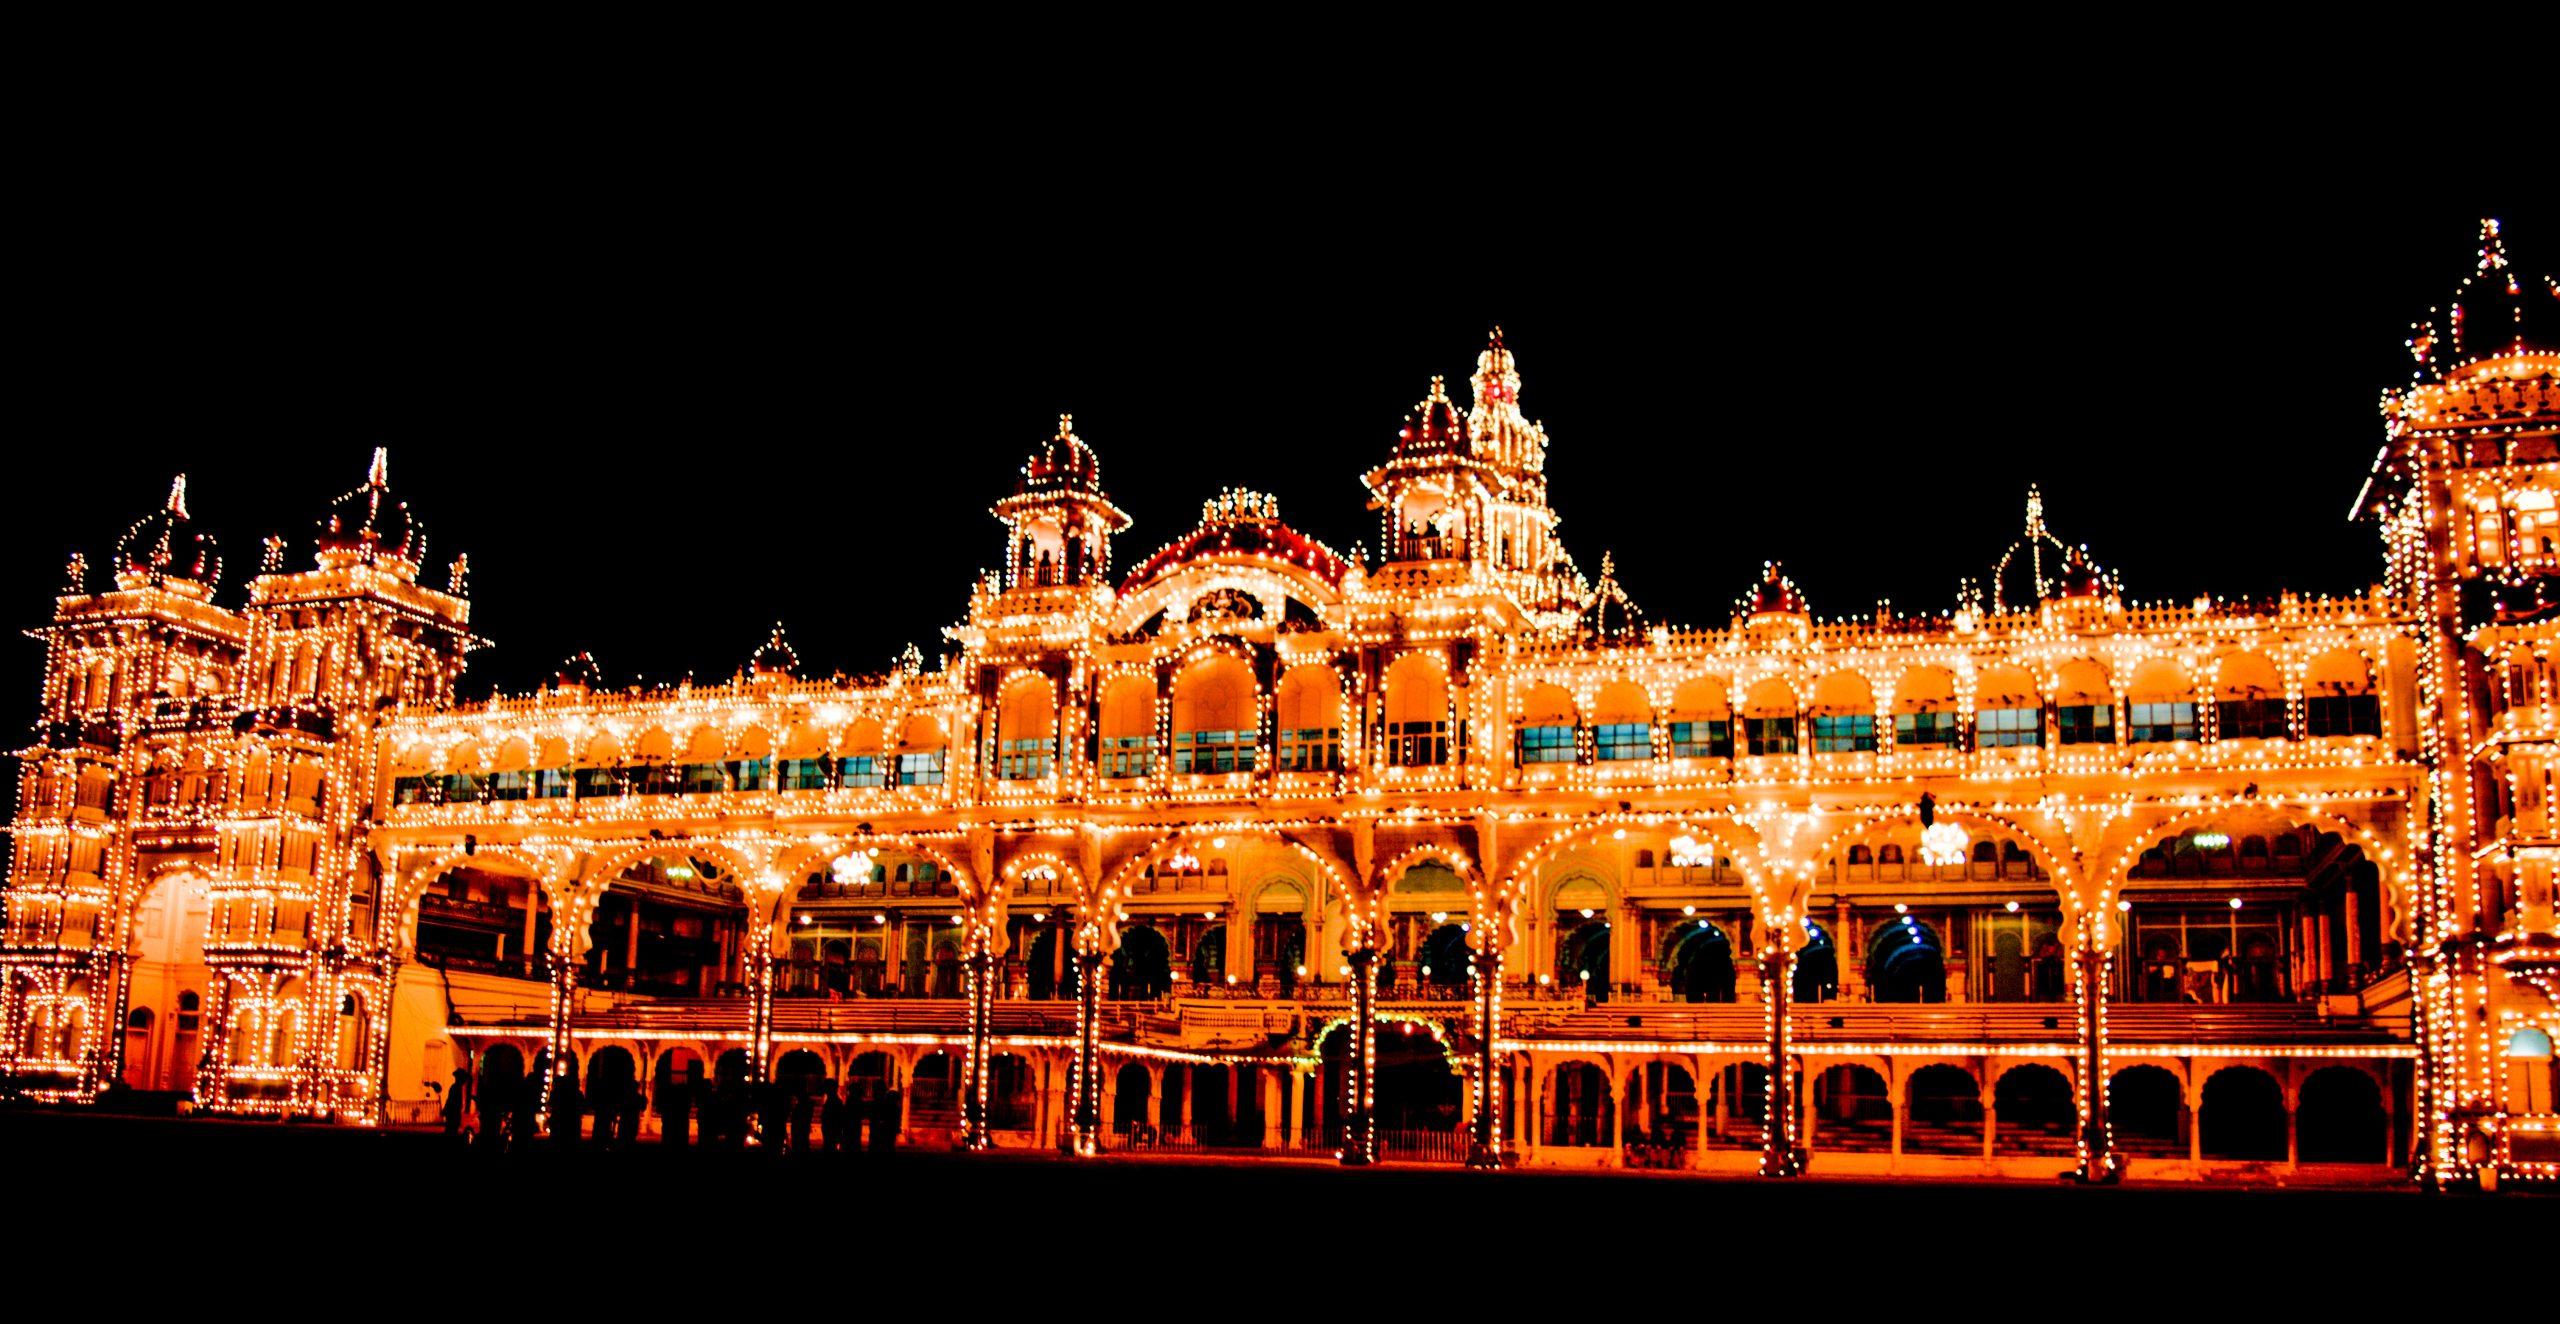 Illuminated Mysore Palace in Karnataka